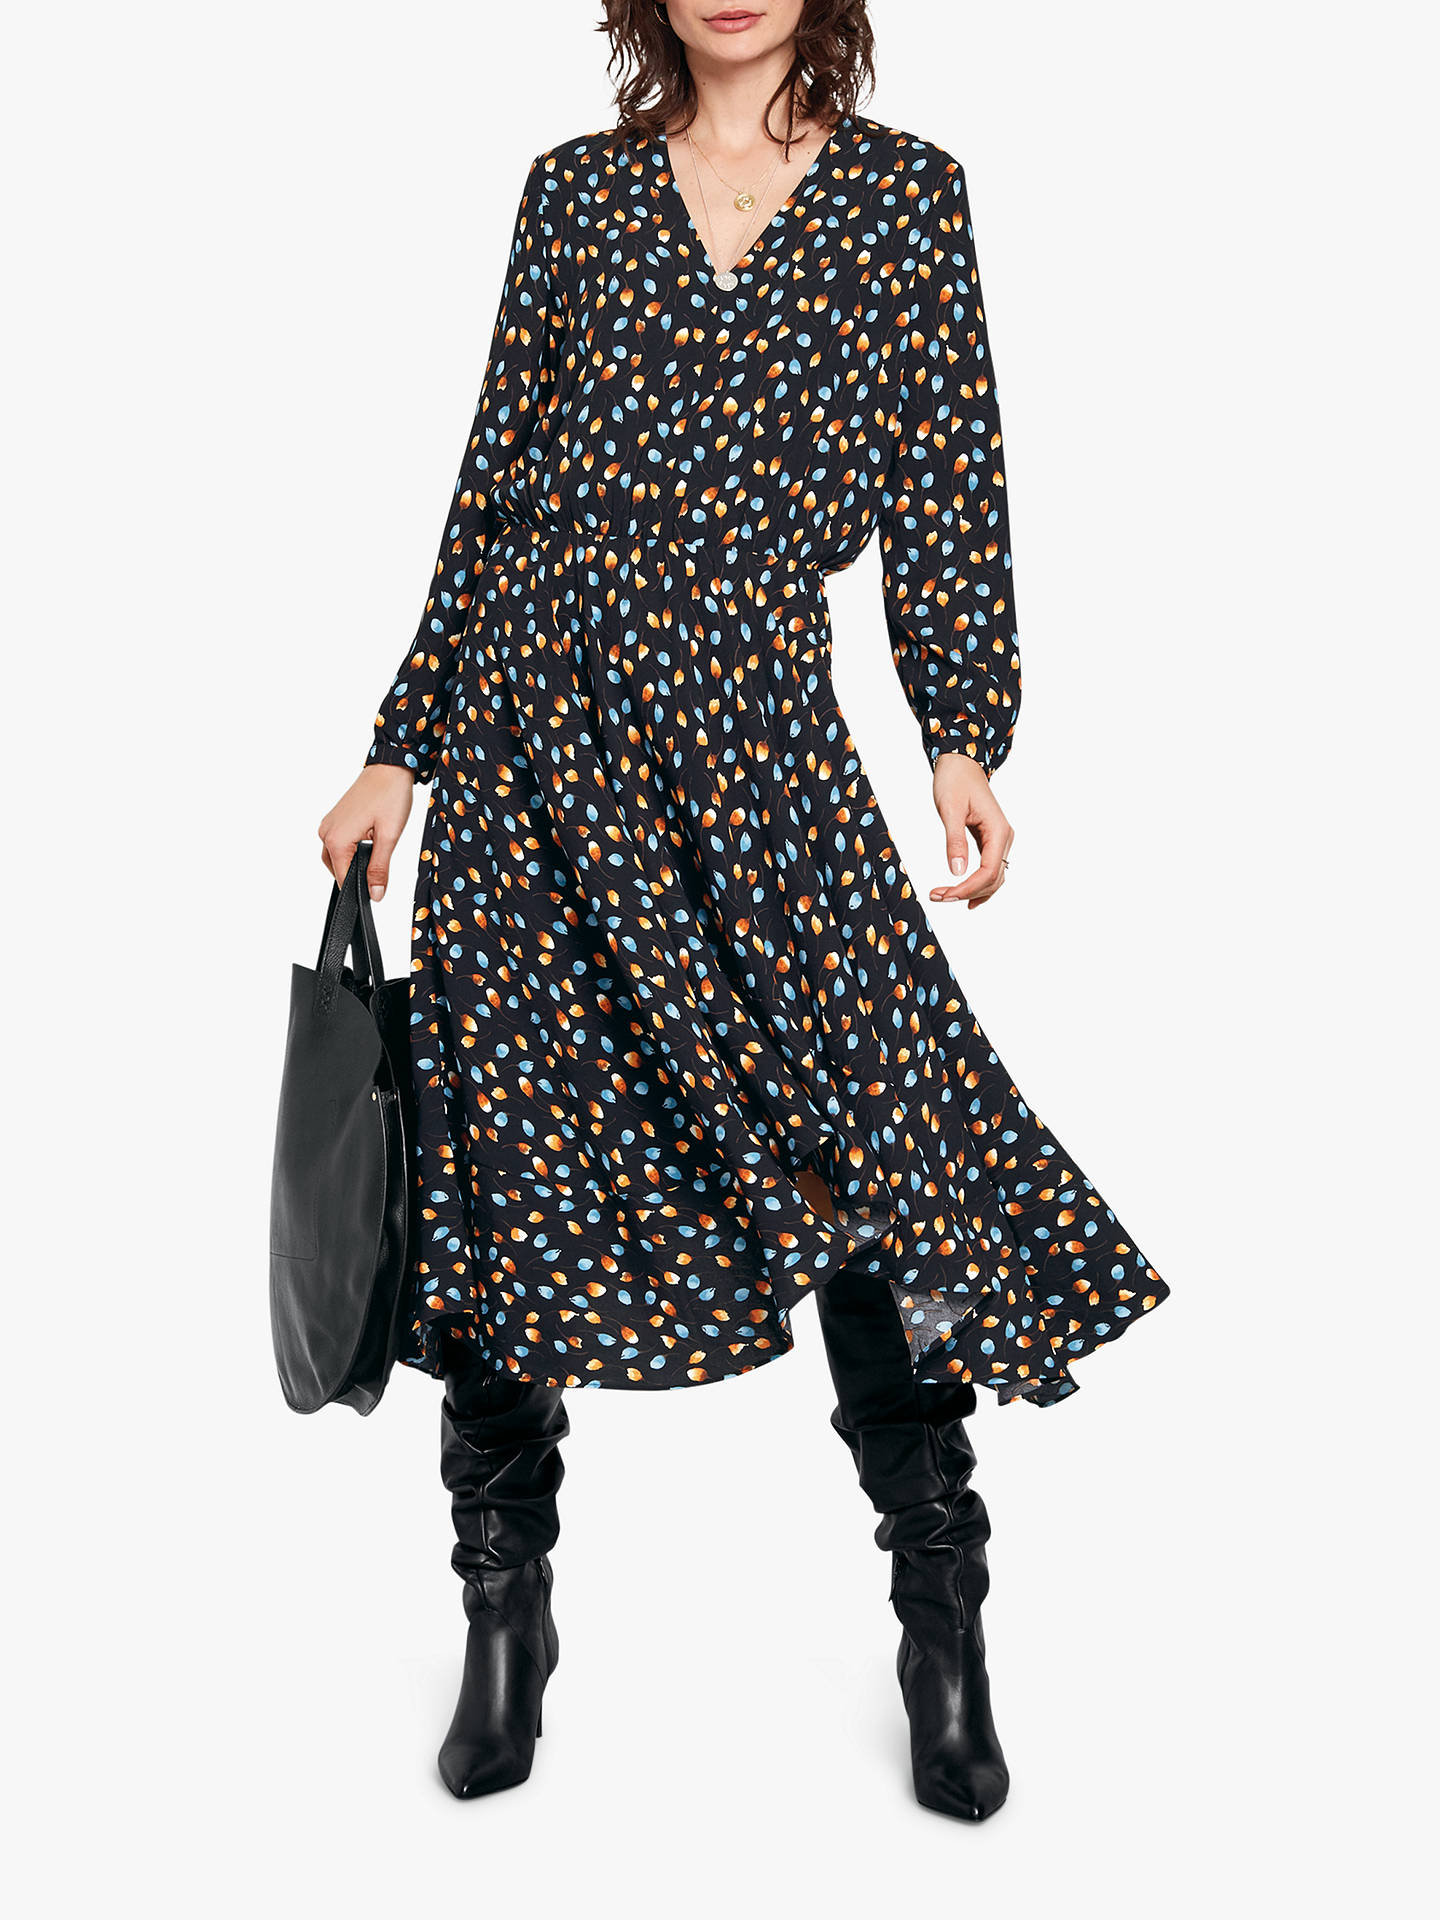 fa299d21a5e Buyhush Idalia Maxi Dress, Black Multi, 8 Online at johnlewis.com ...